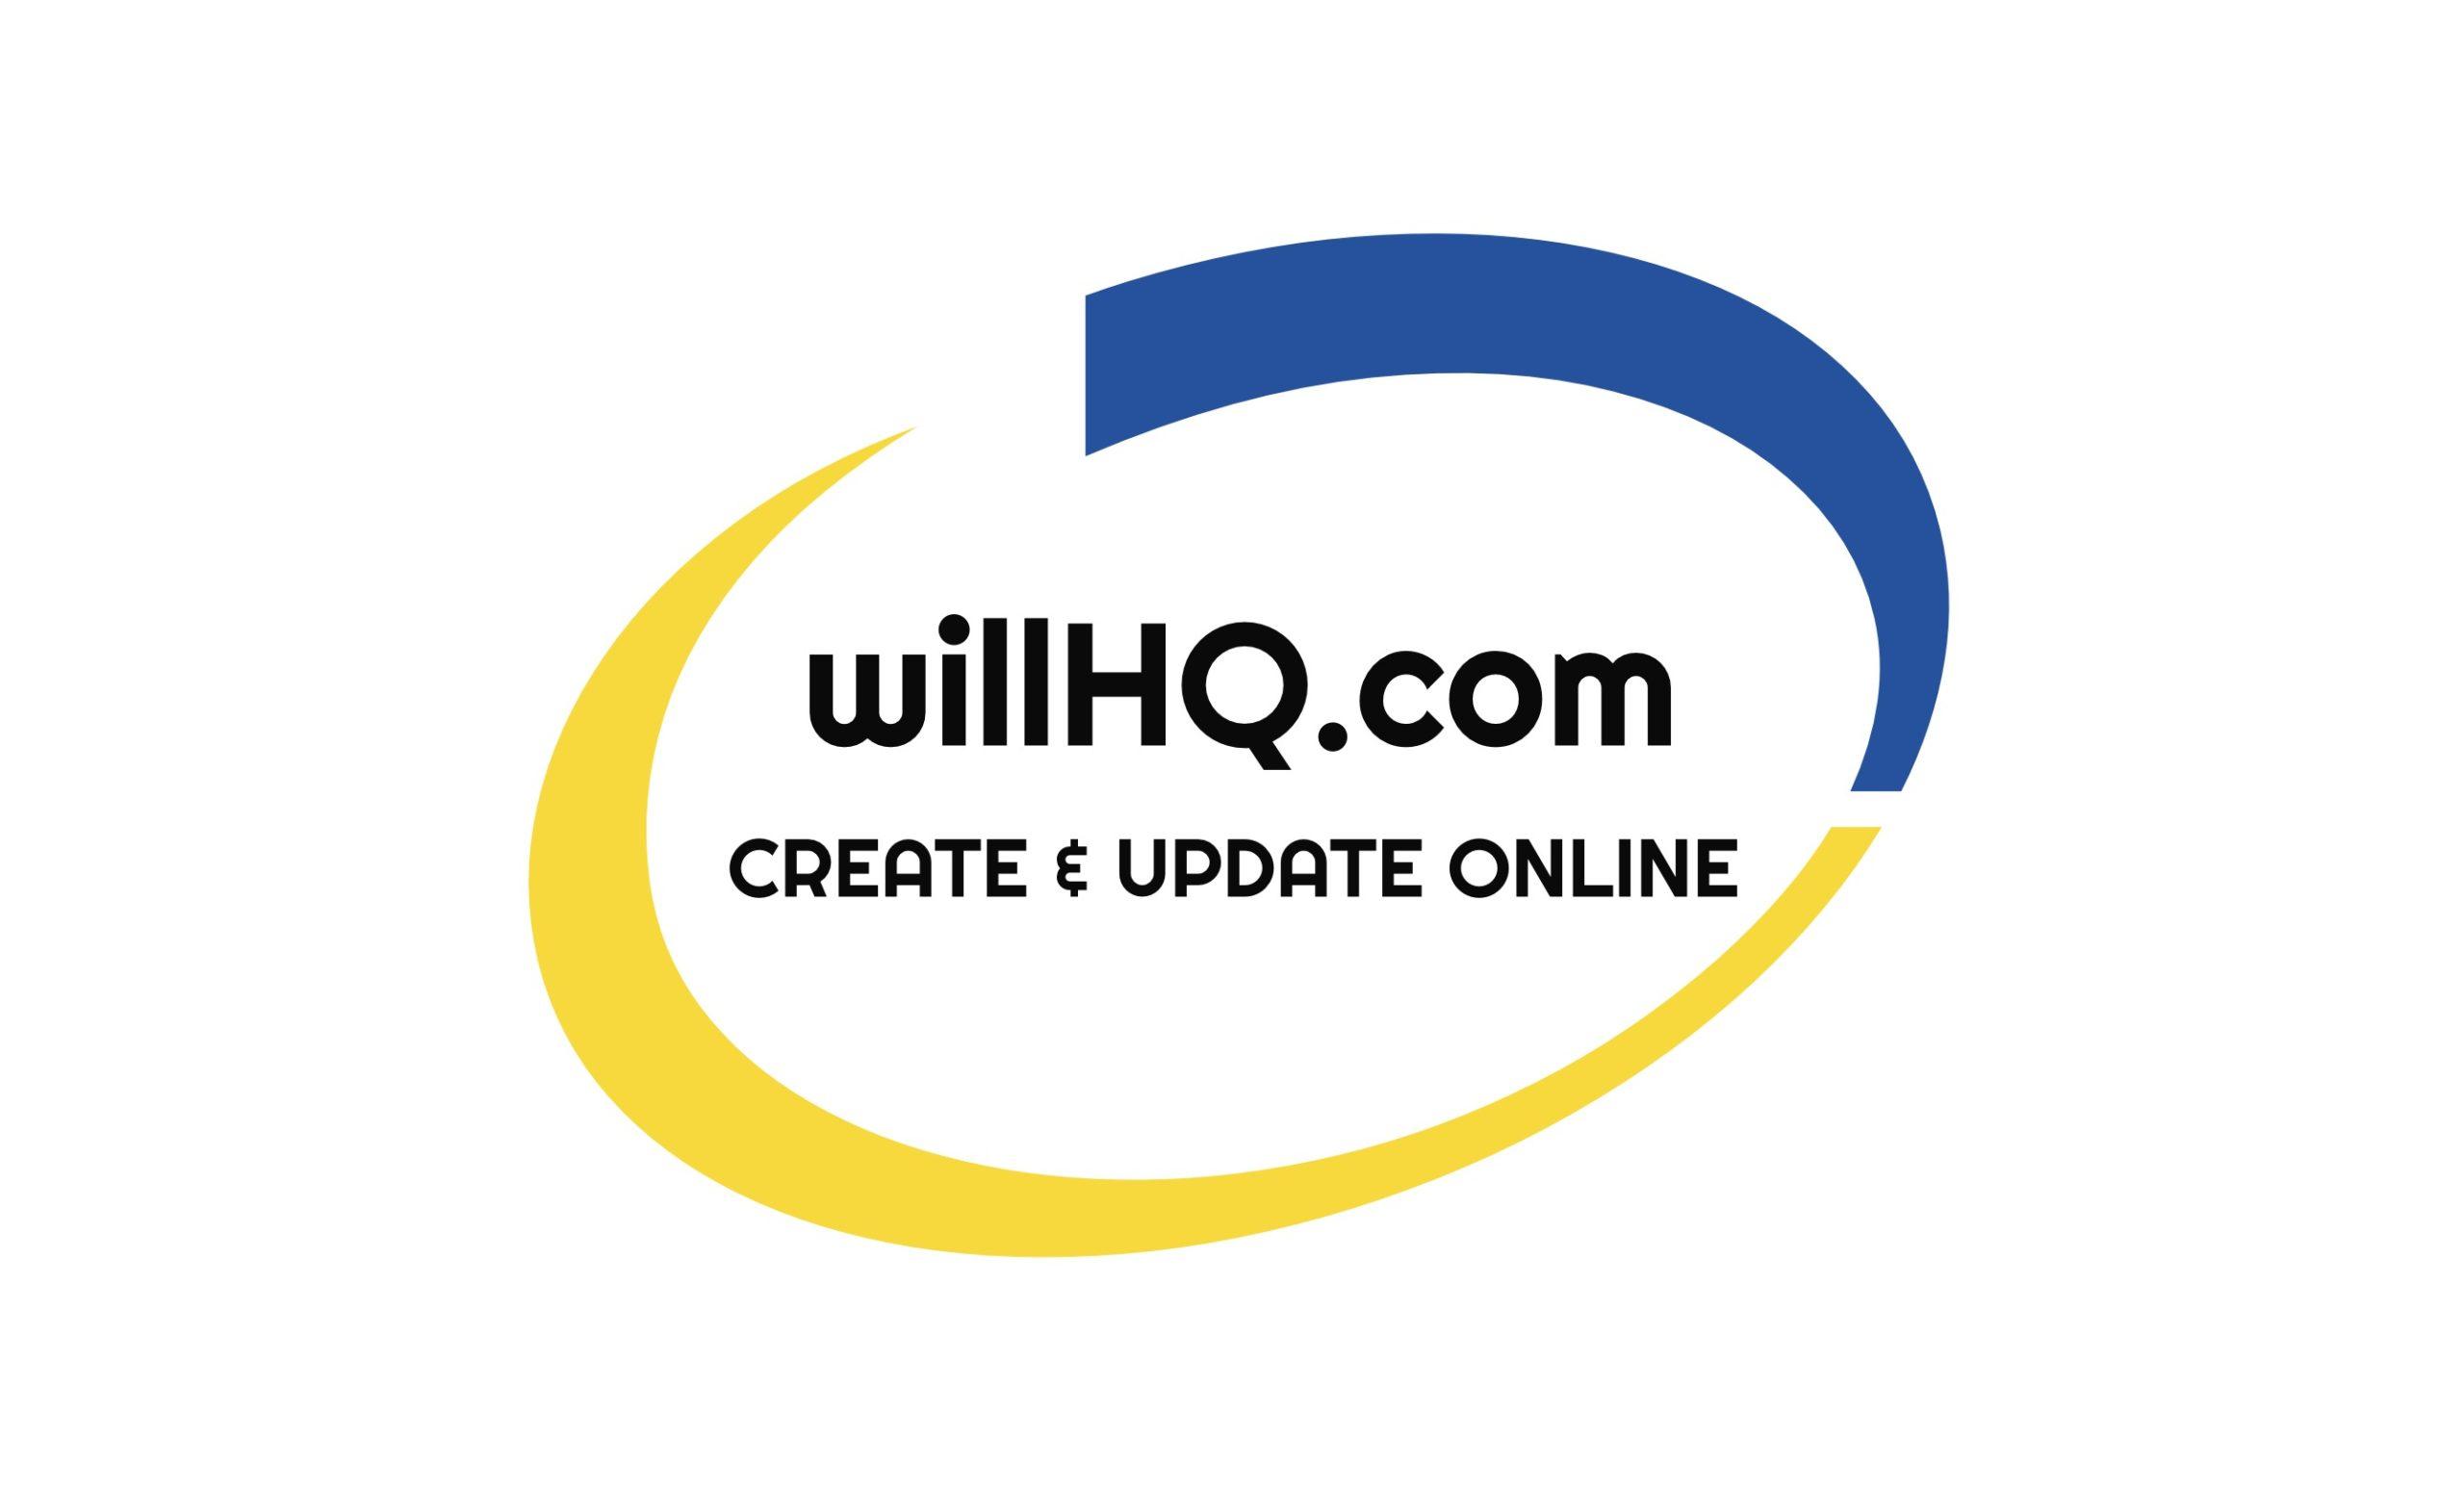 Will HQ